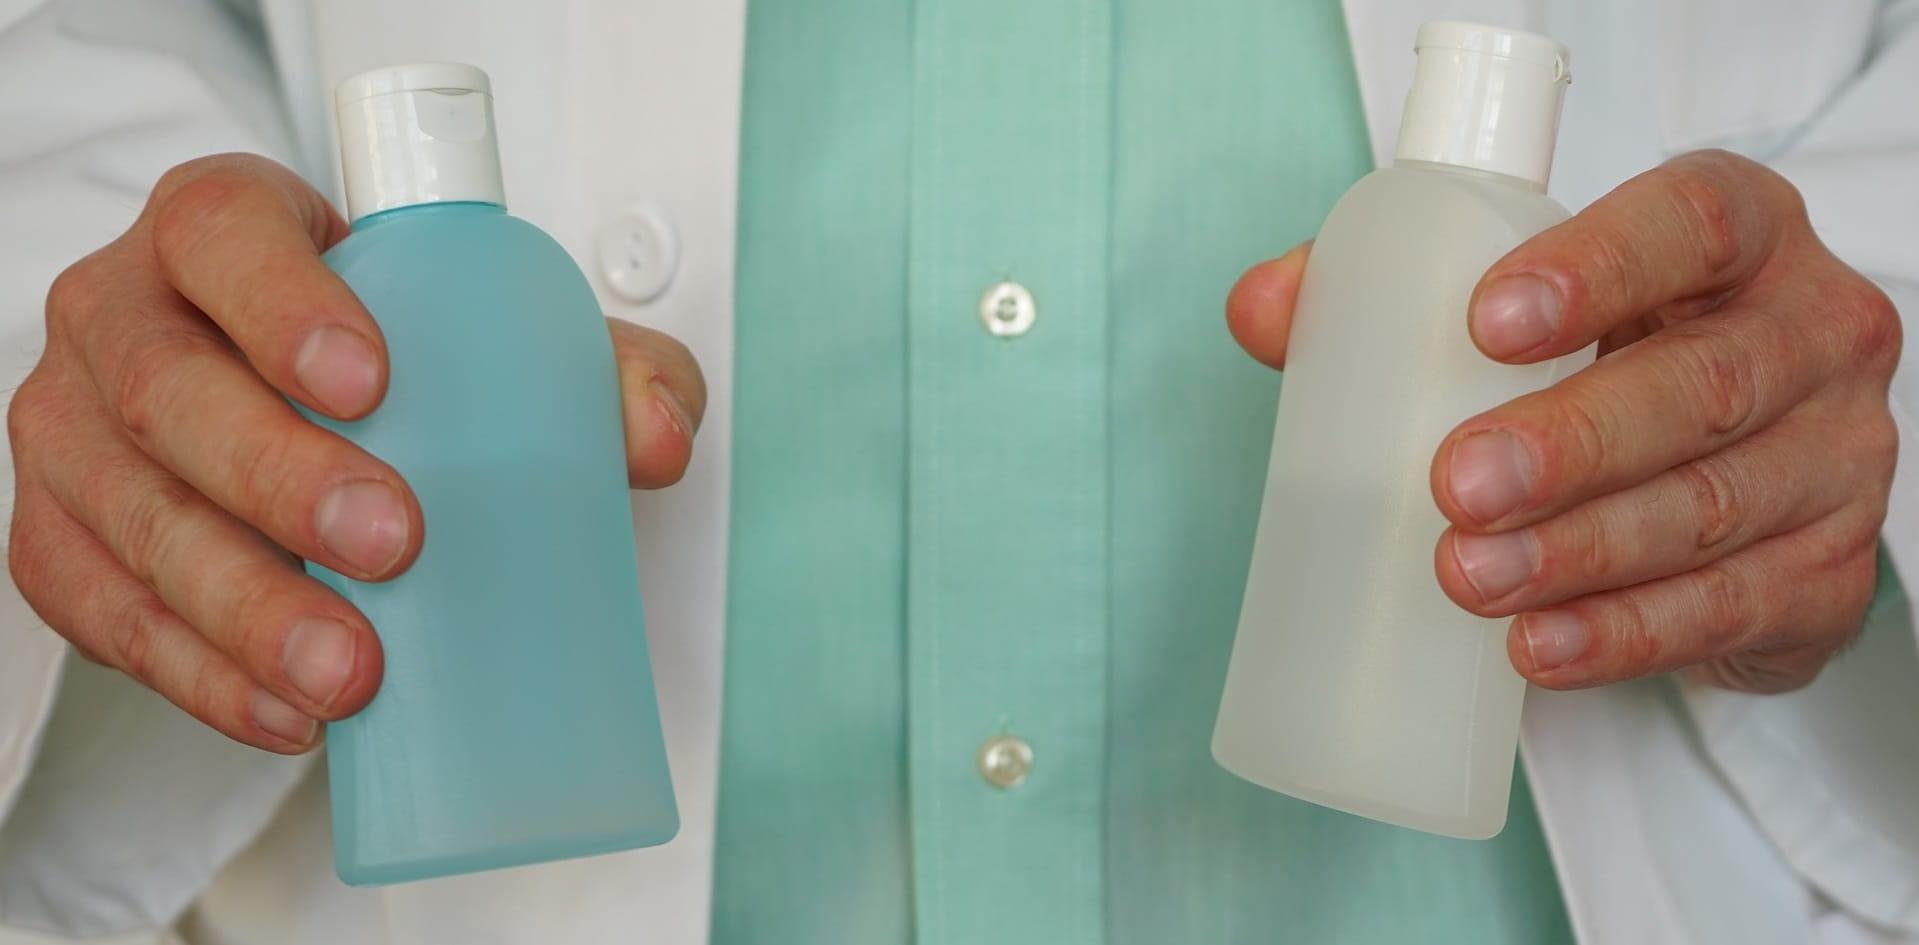 Arzt zeigt zwei Flaschen Handdesinfektion